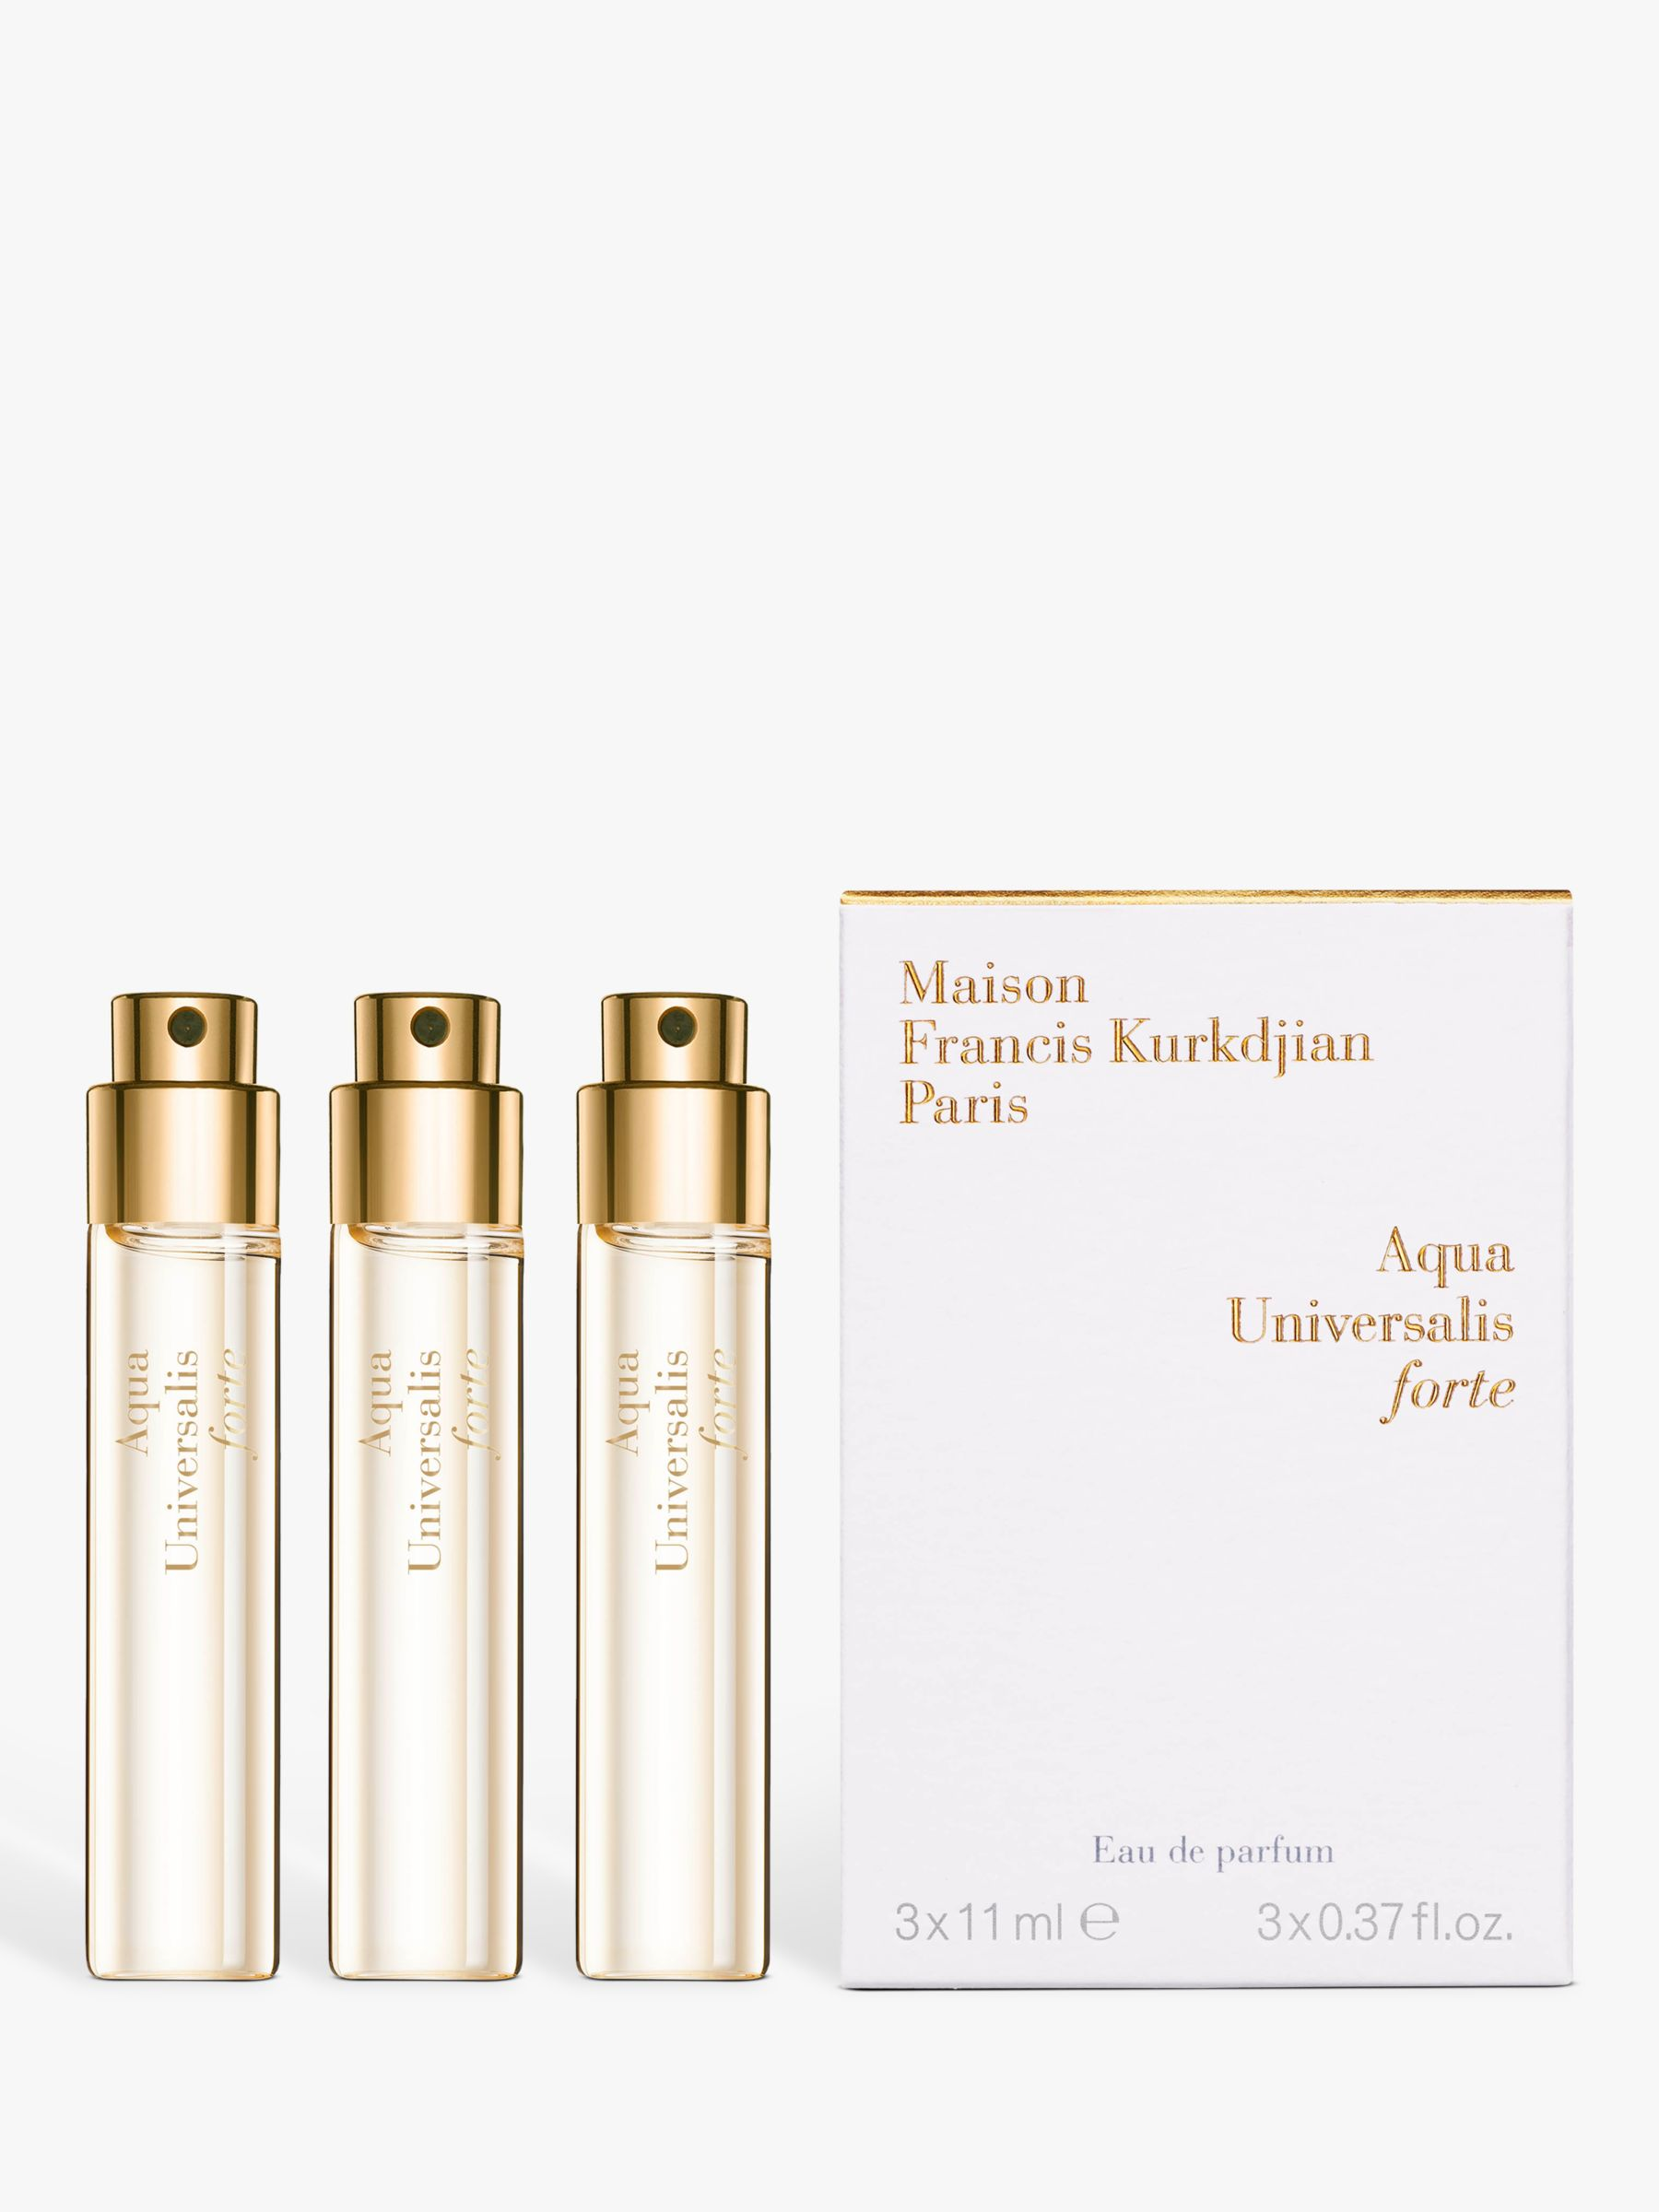 Maison Francis Kurkdjian Maison Francis Kurkdjian Aqua Universalis Forte Eau de Parfum Natural Spray Refills 3 x 11ml